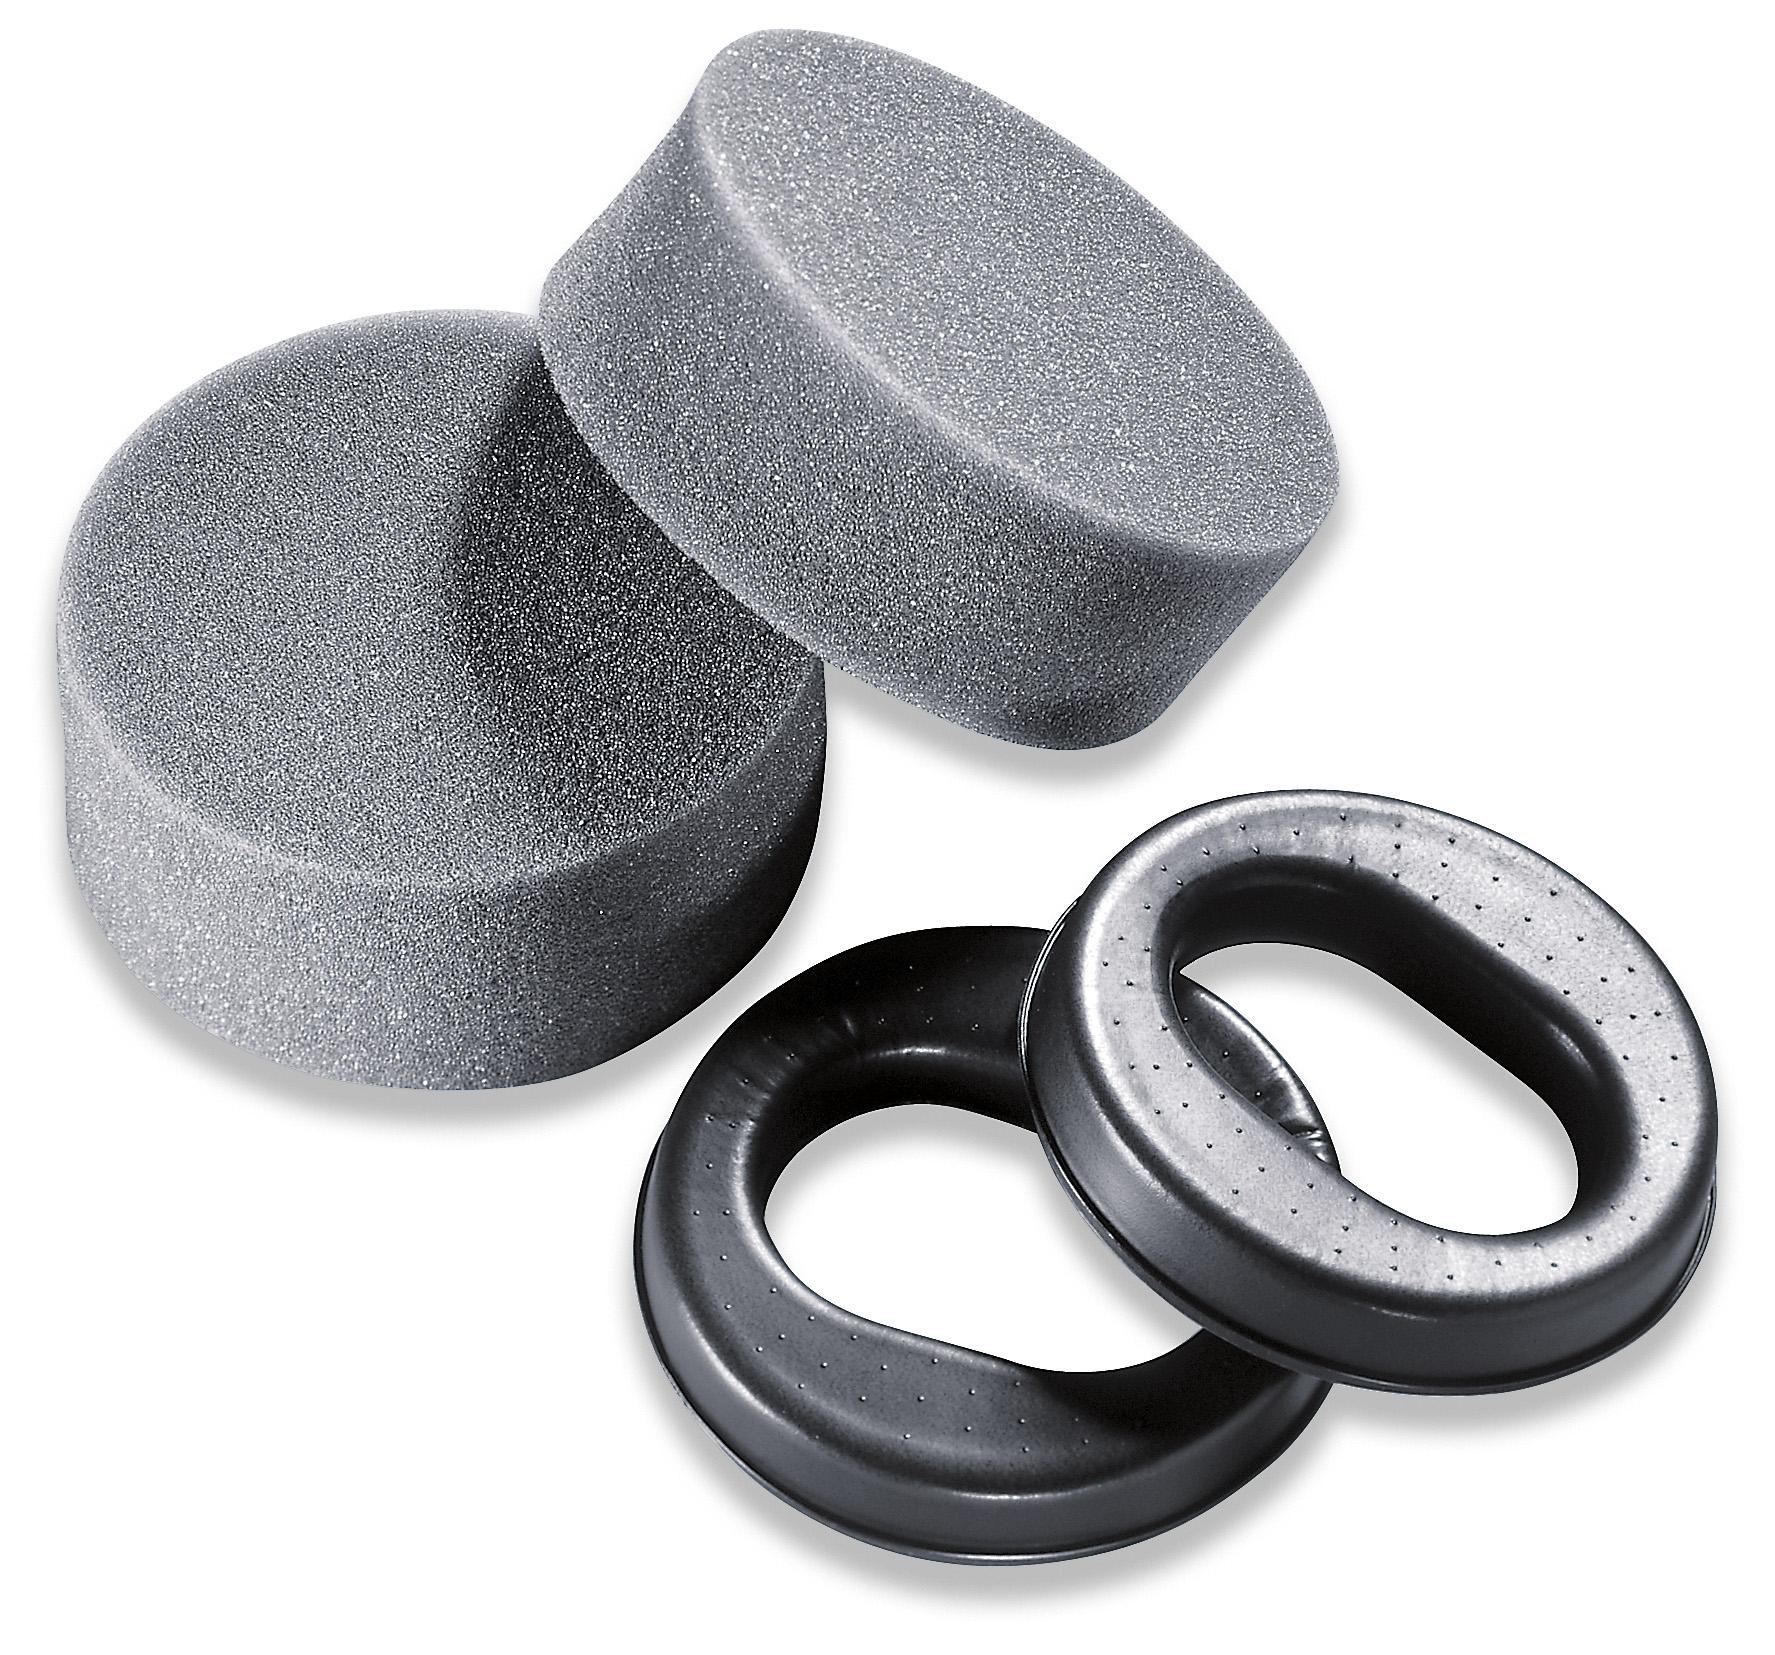 uvex hygiene kit f r b gelgeh rschutz uvex safety pro. Black Bedroom Furniture Sets. Home Design Ideas